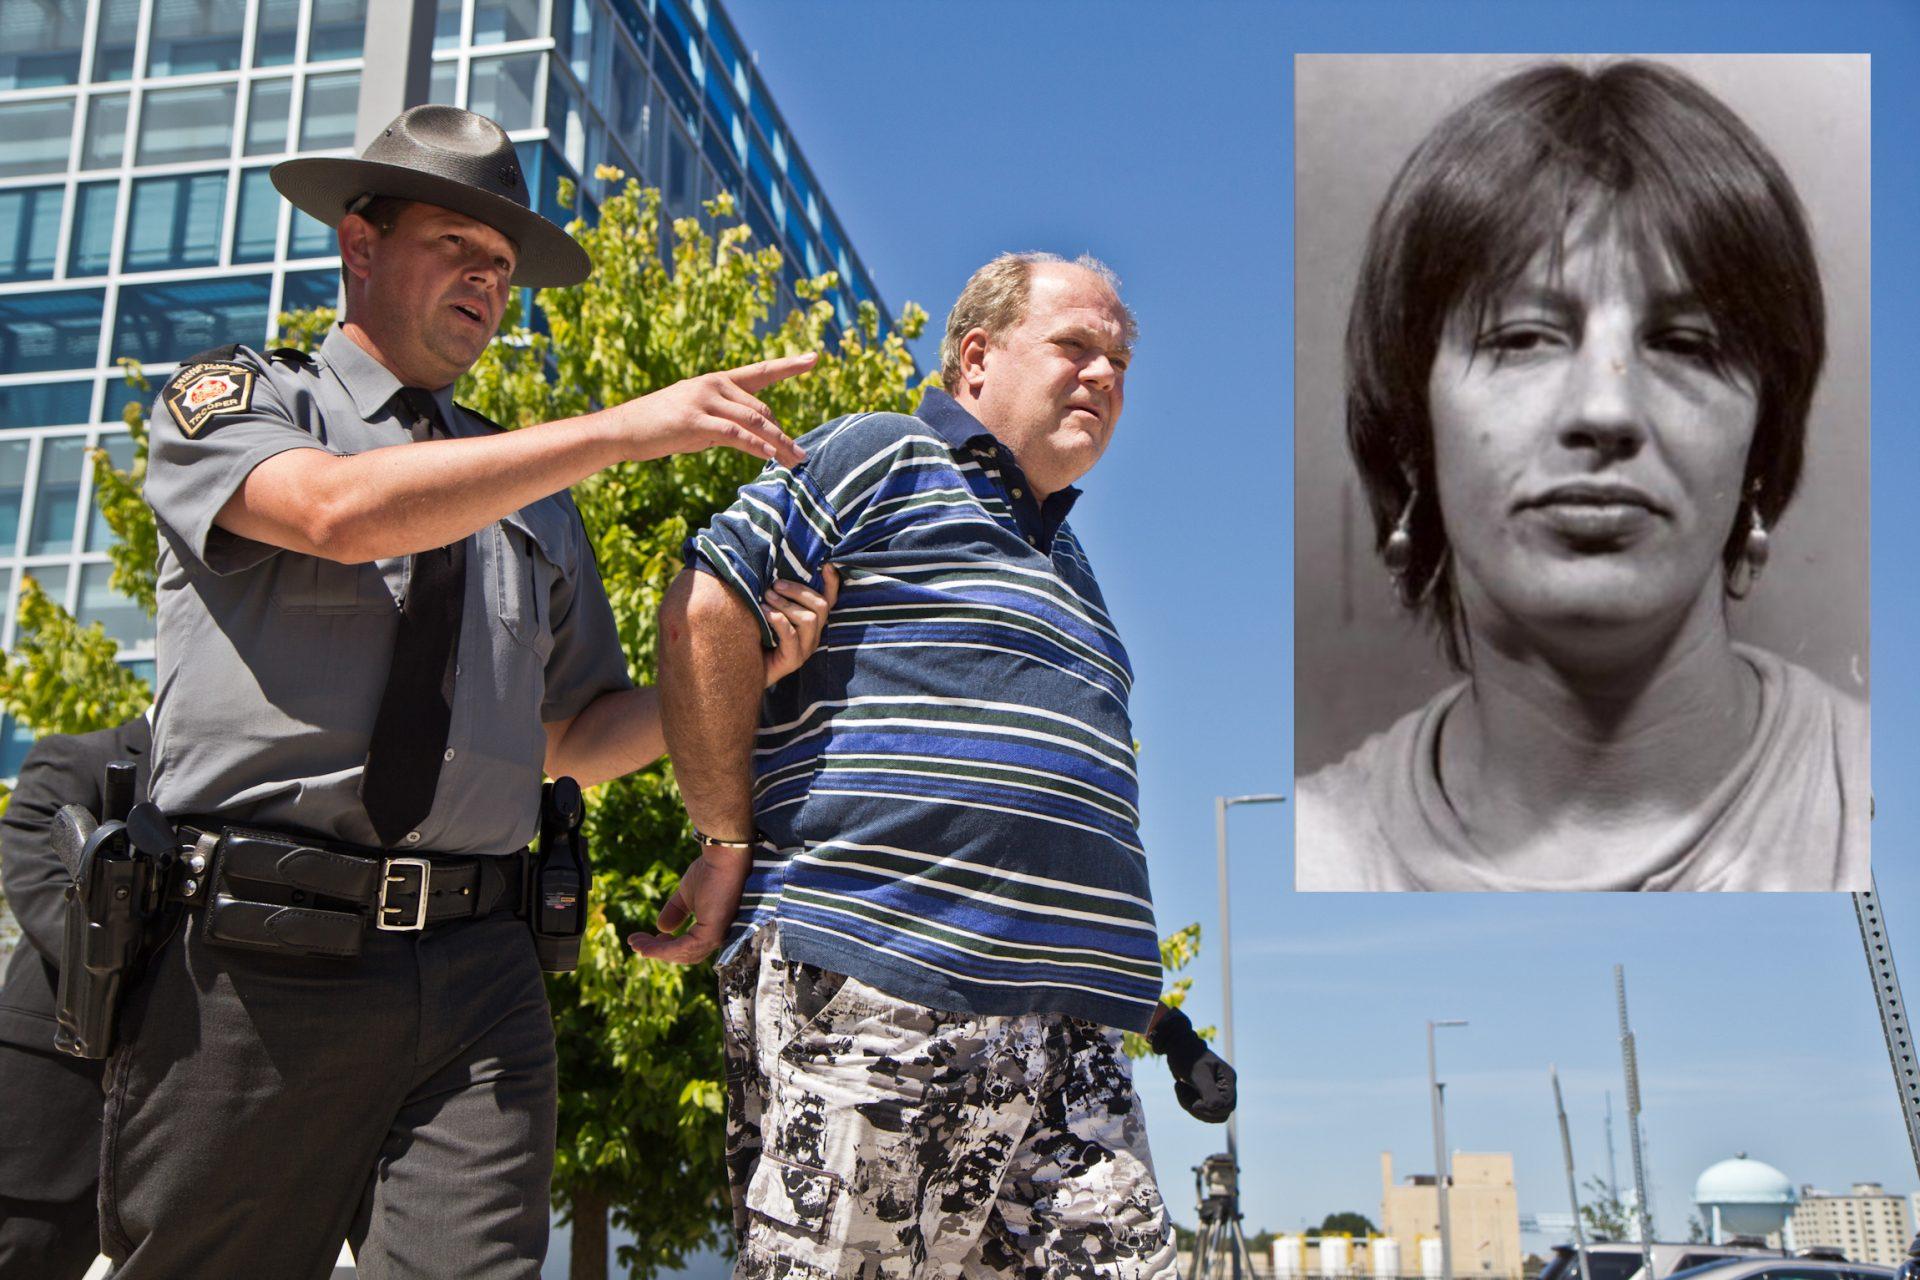 Authorities: Socks help solve 1991 murder of Pa  woman | WITF